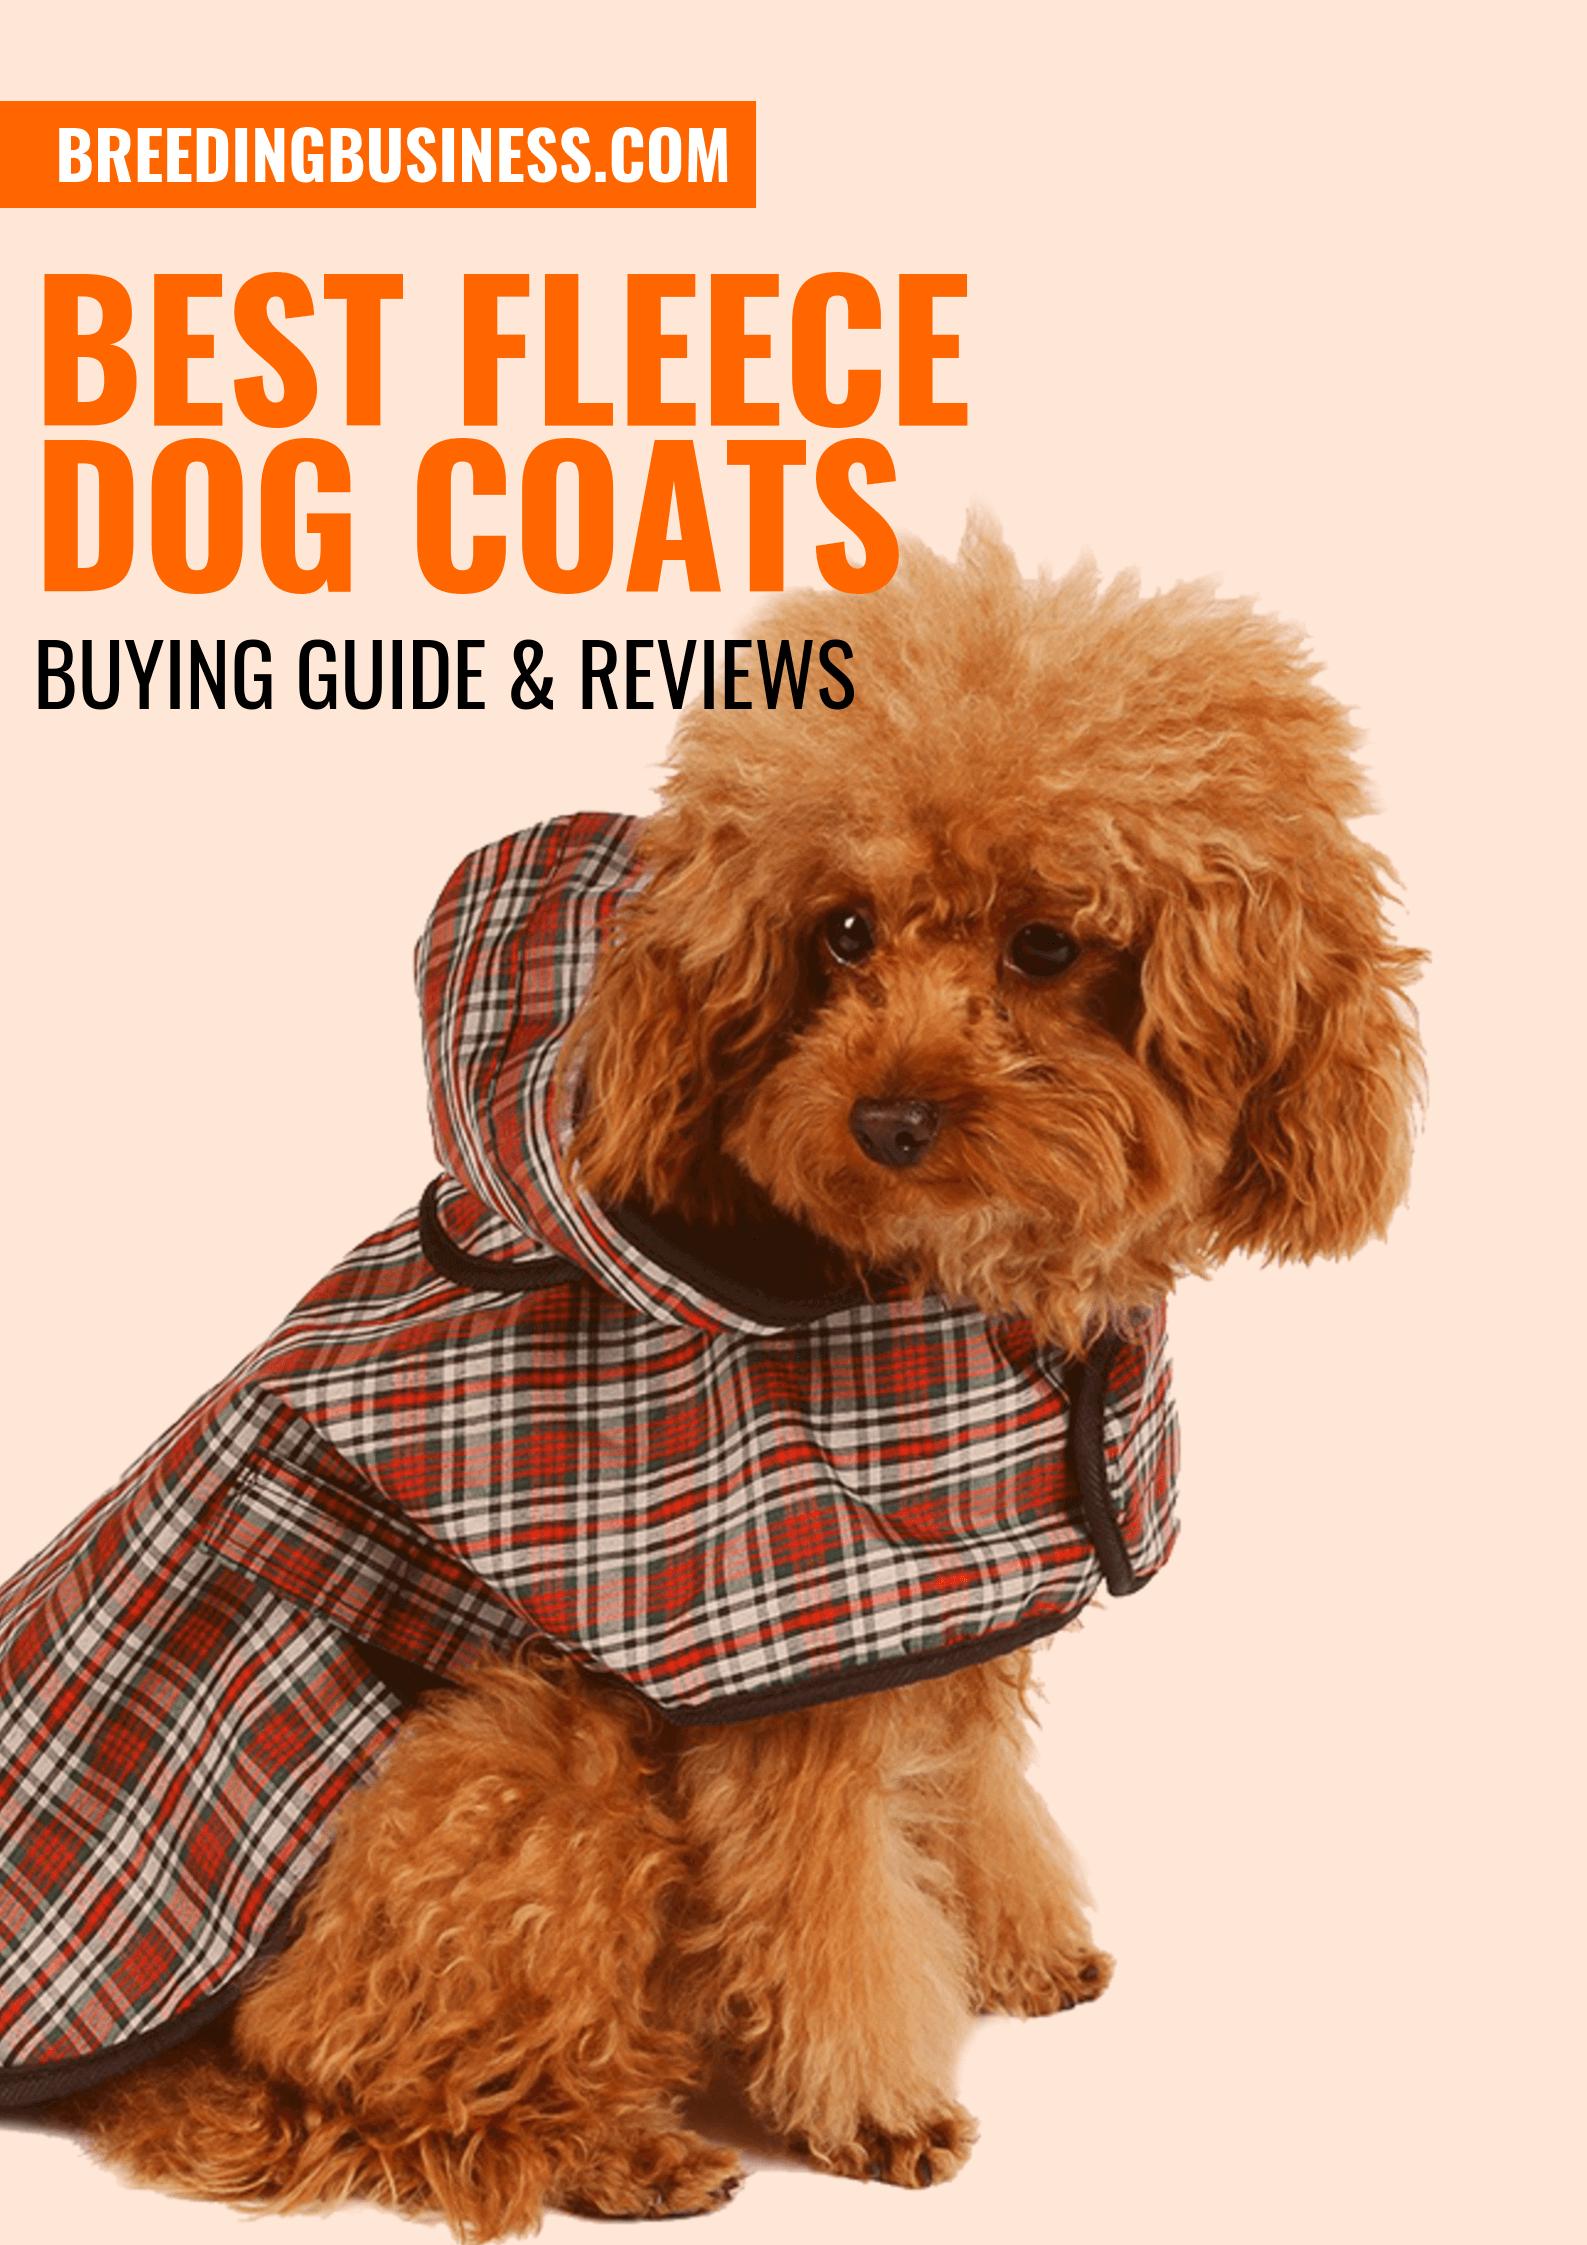 Guide – Wintertime Fleece Dog Coats